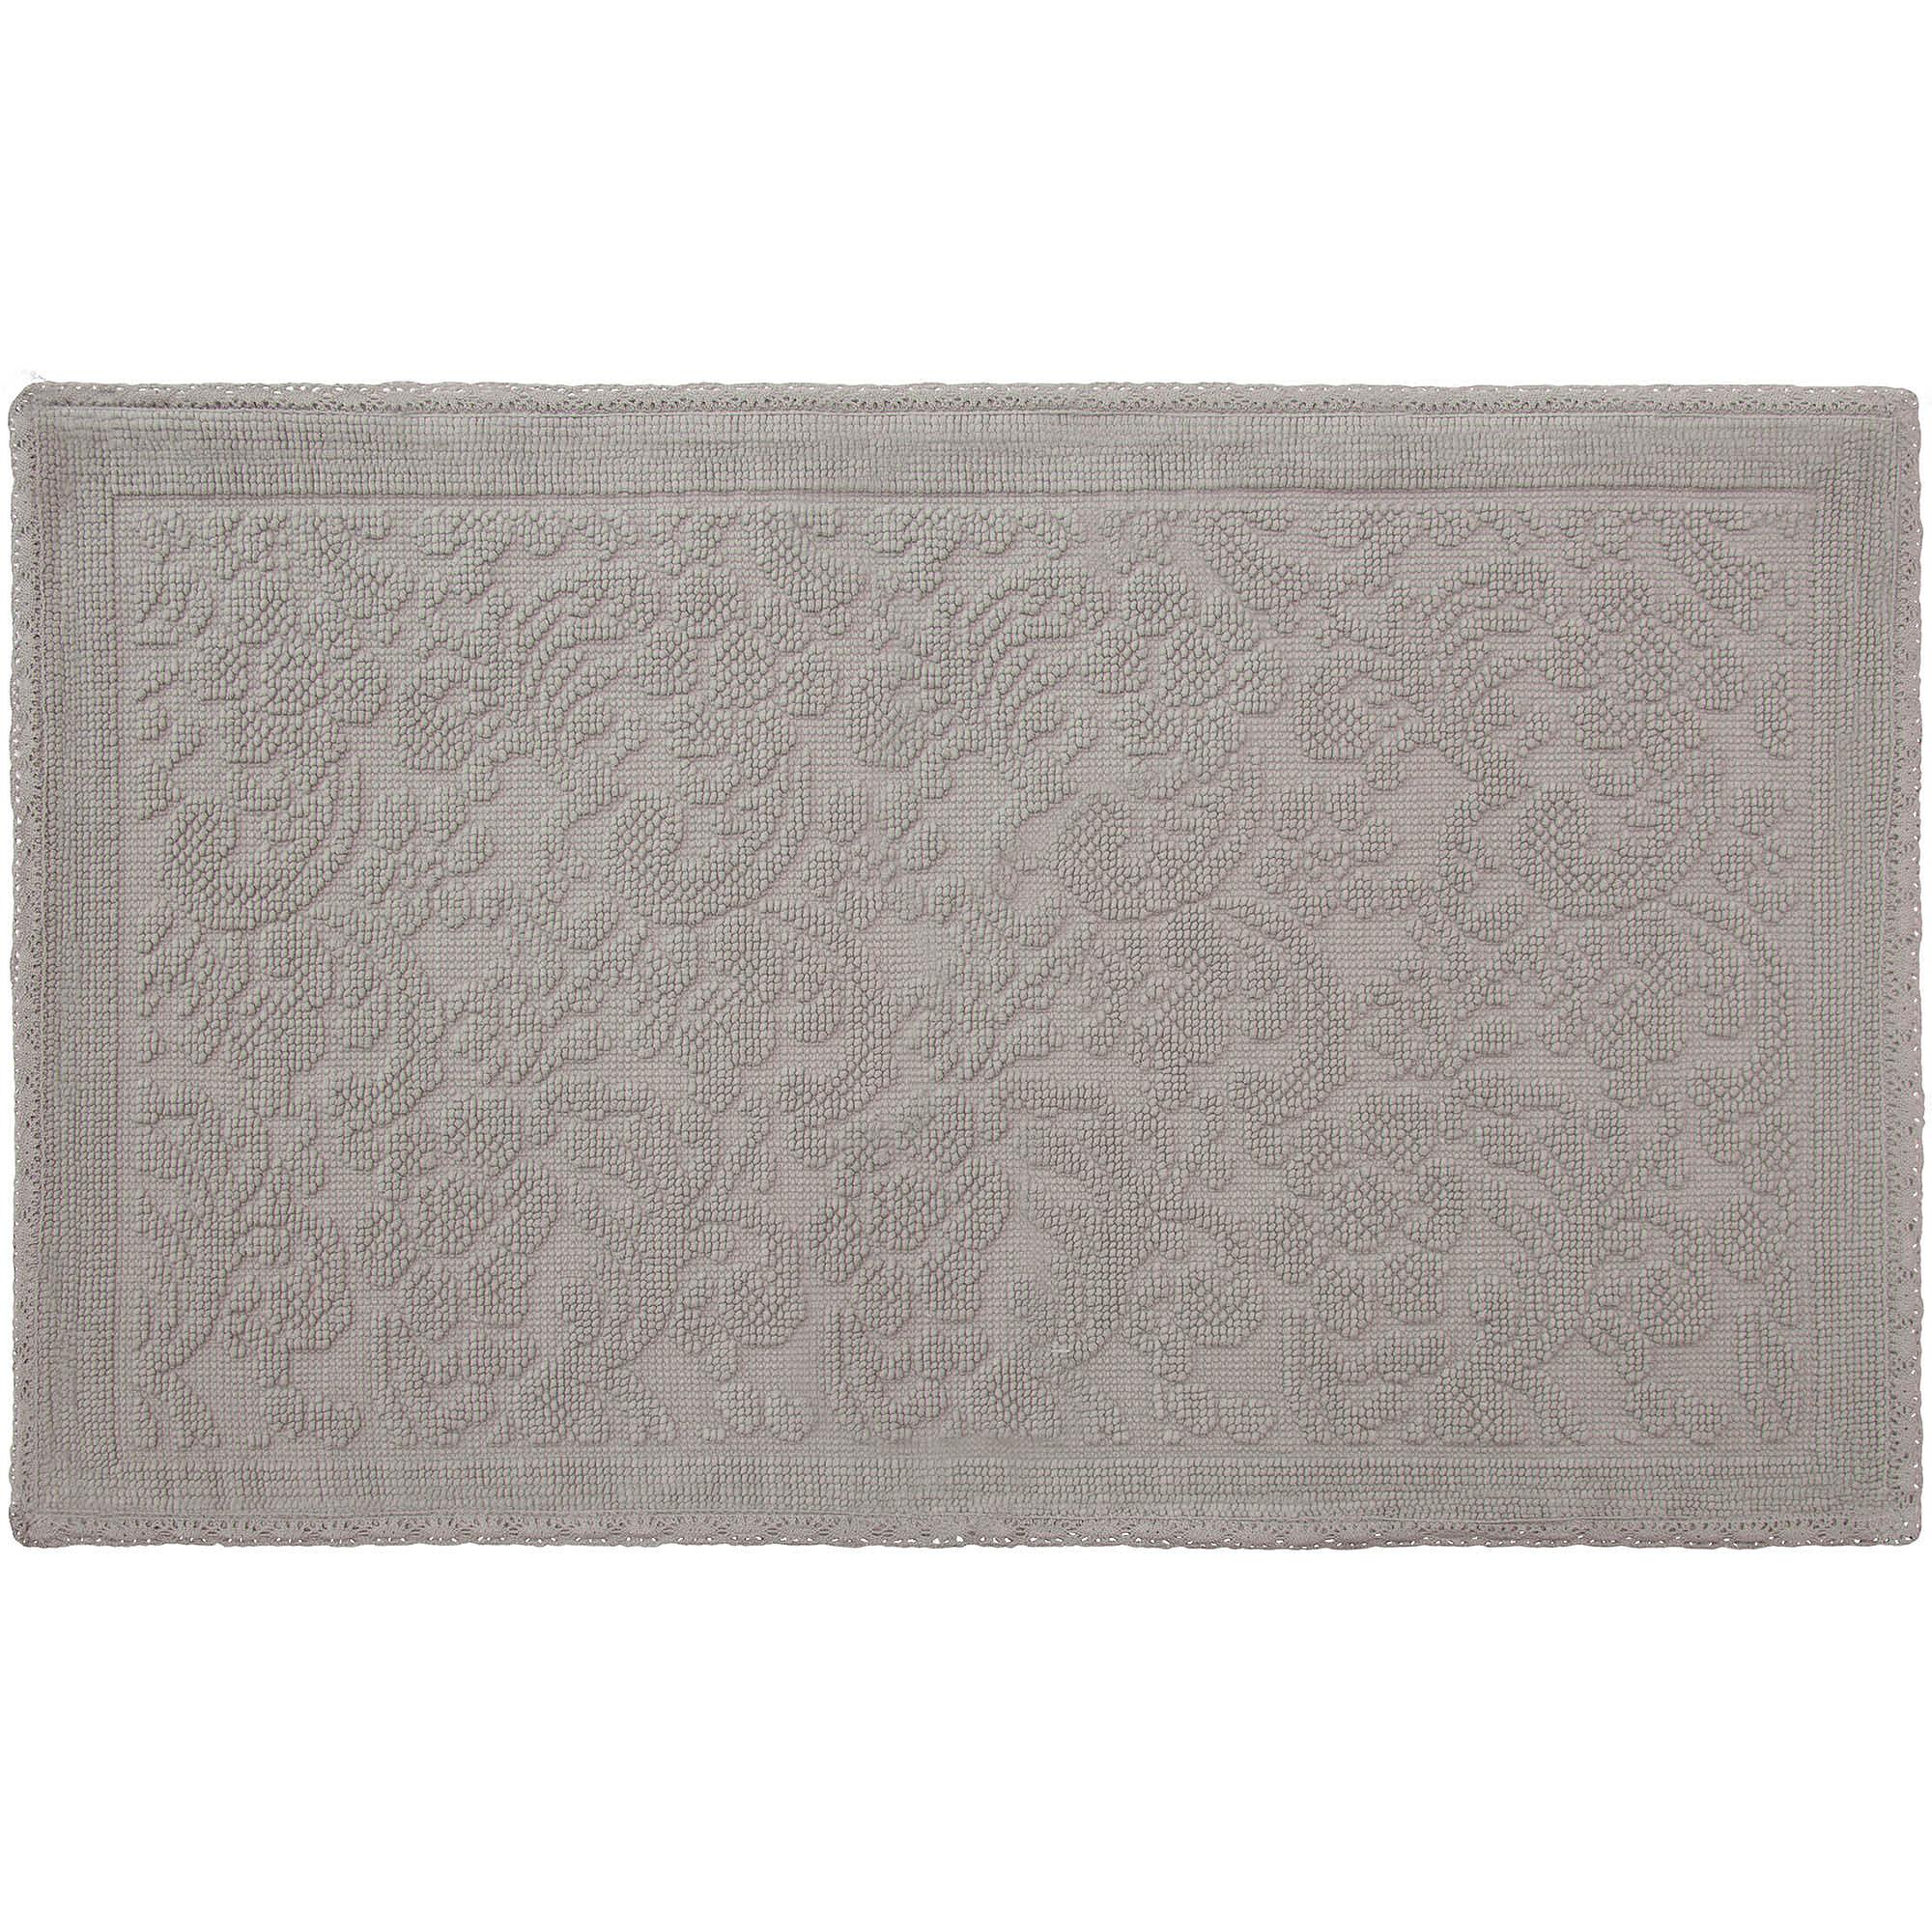 Turkish Cotton Flat Weave Bath Rug Collection